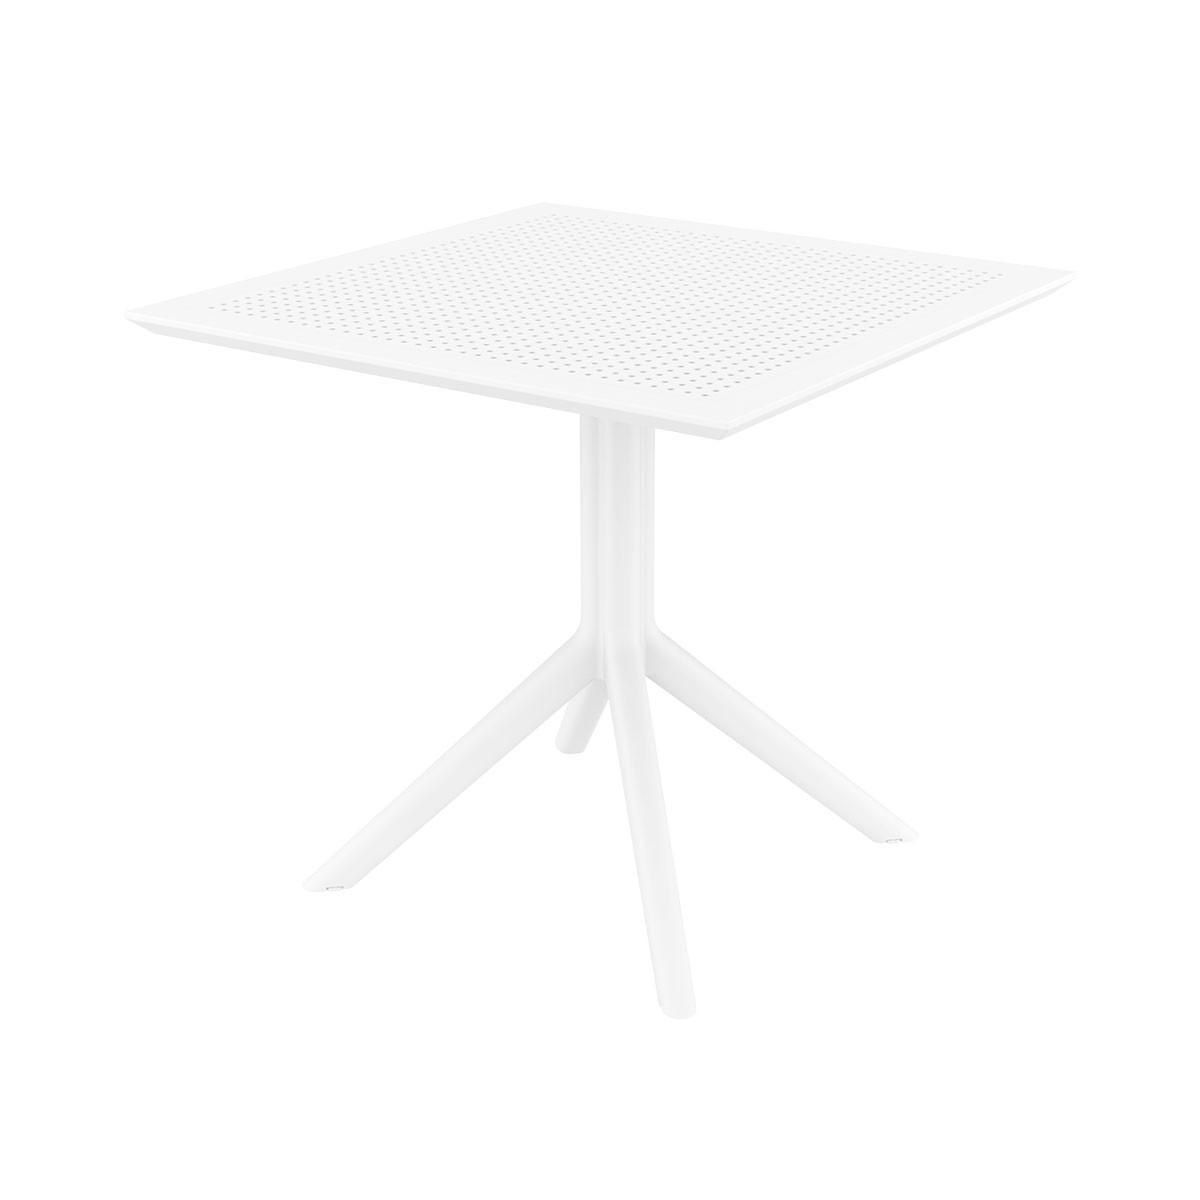 Table SKY blanc en polypropylène renforcé - Siesta